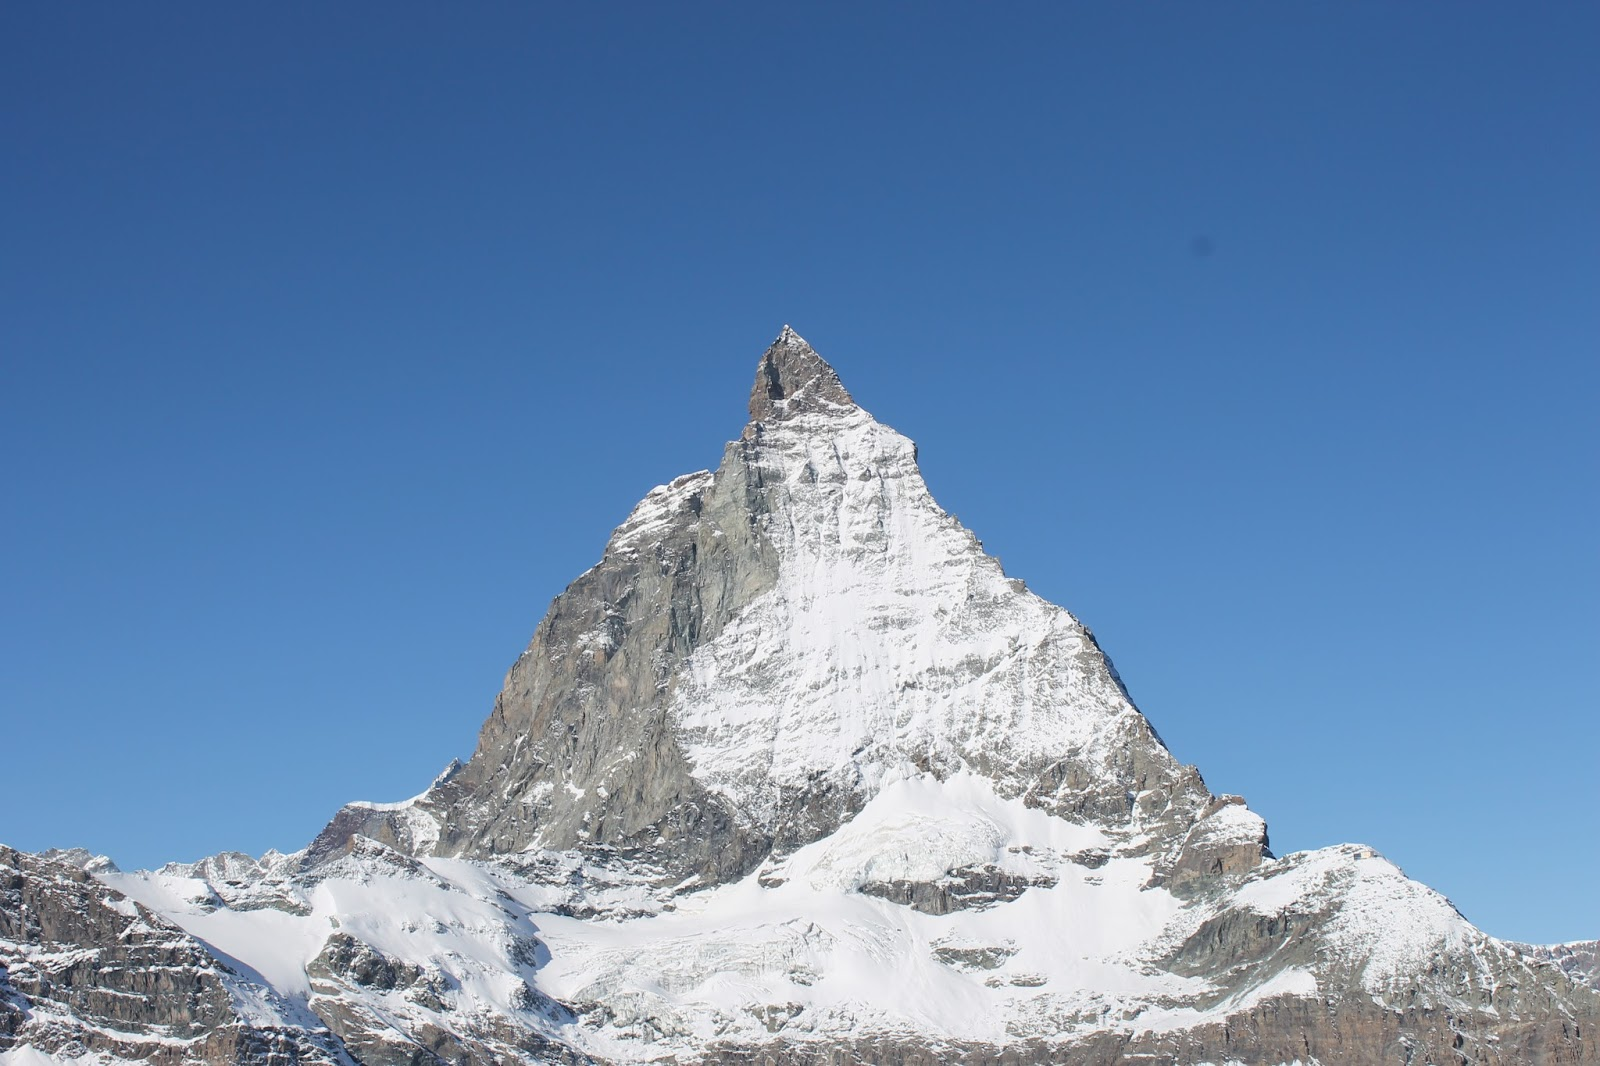 Vista Matterhorn do Glacier Paradise - Zermatt